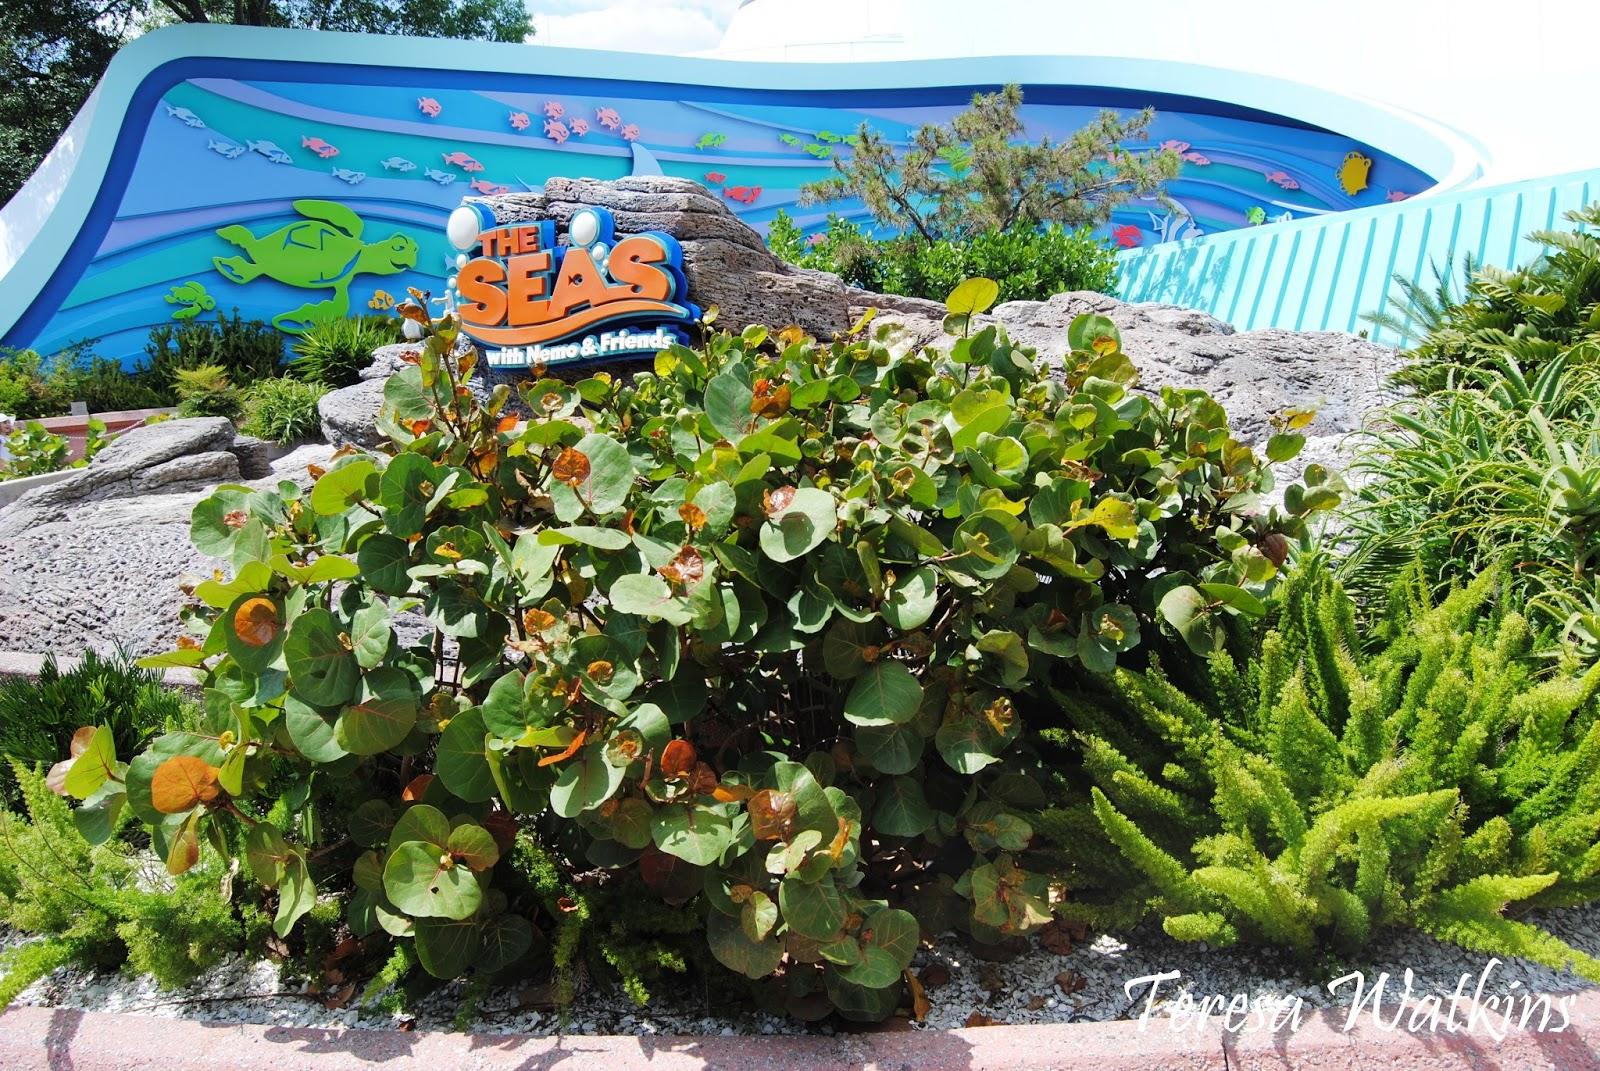 Earth Shattering Gardening: May 2015